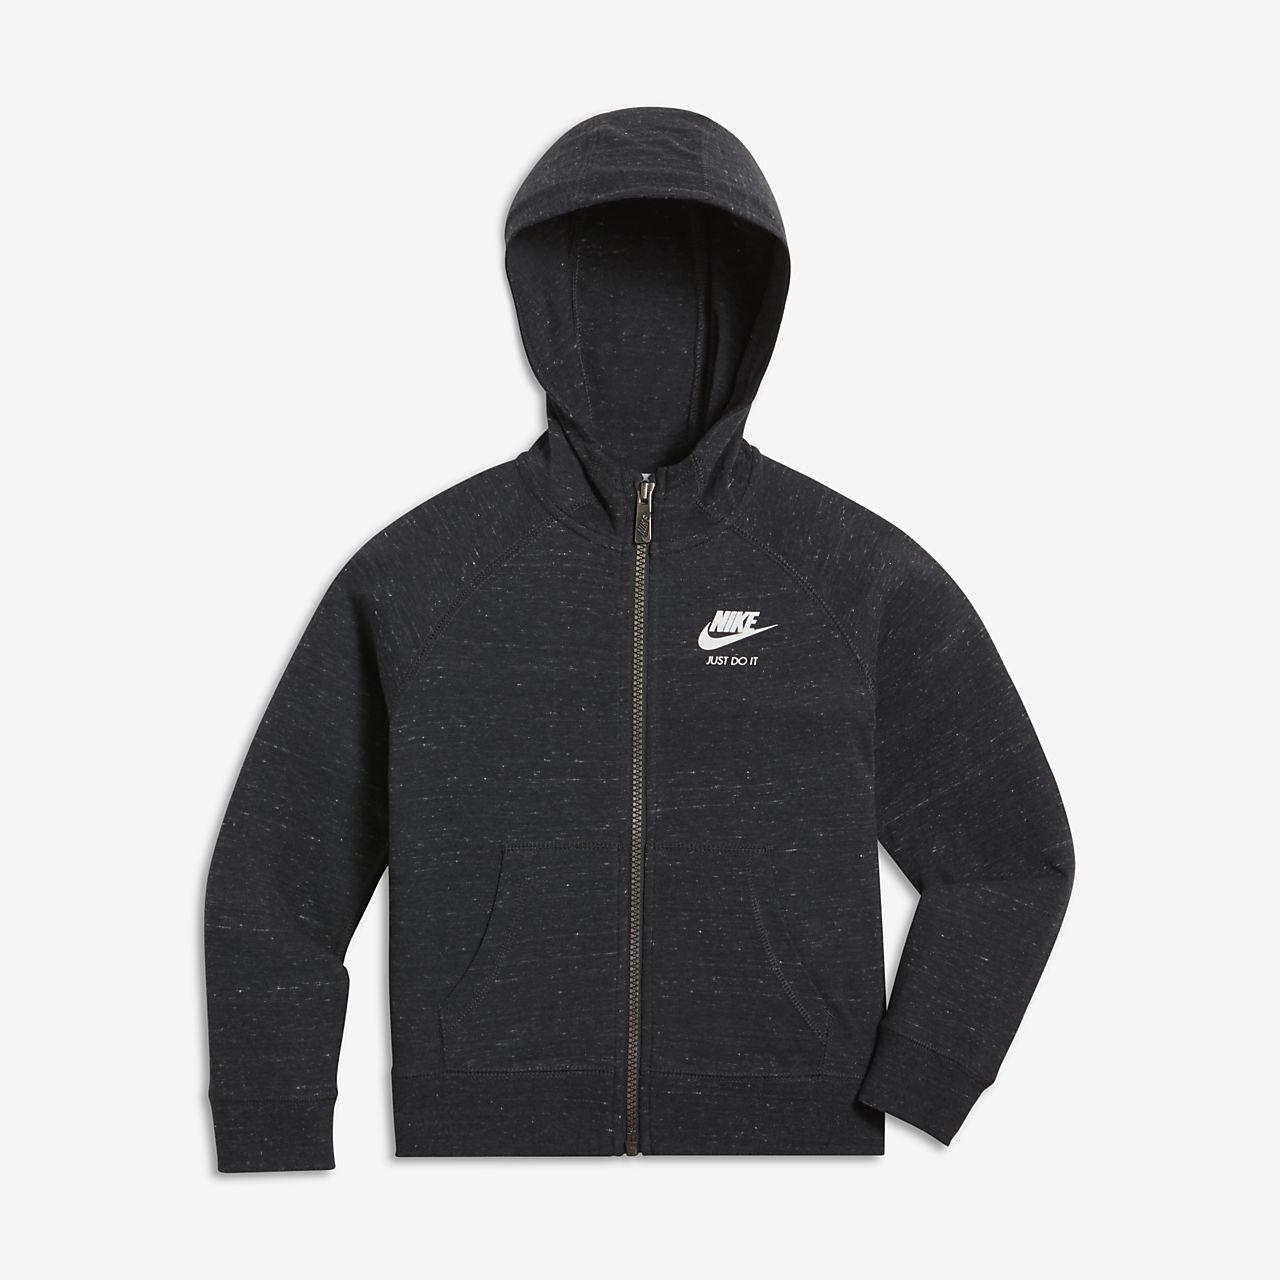 Vintage Entièrement Nike Capuche Gym Zippé Sportswear Gxatn Pour Sweat À Xn85wUq